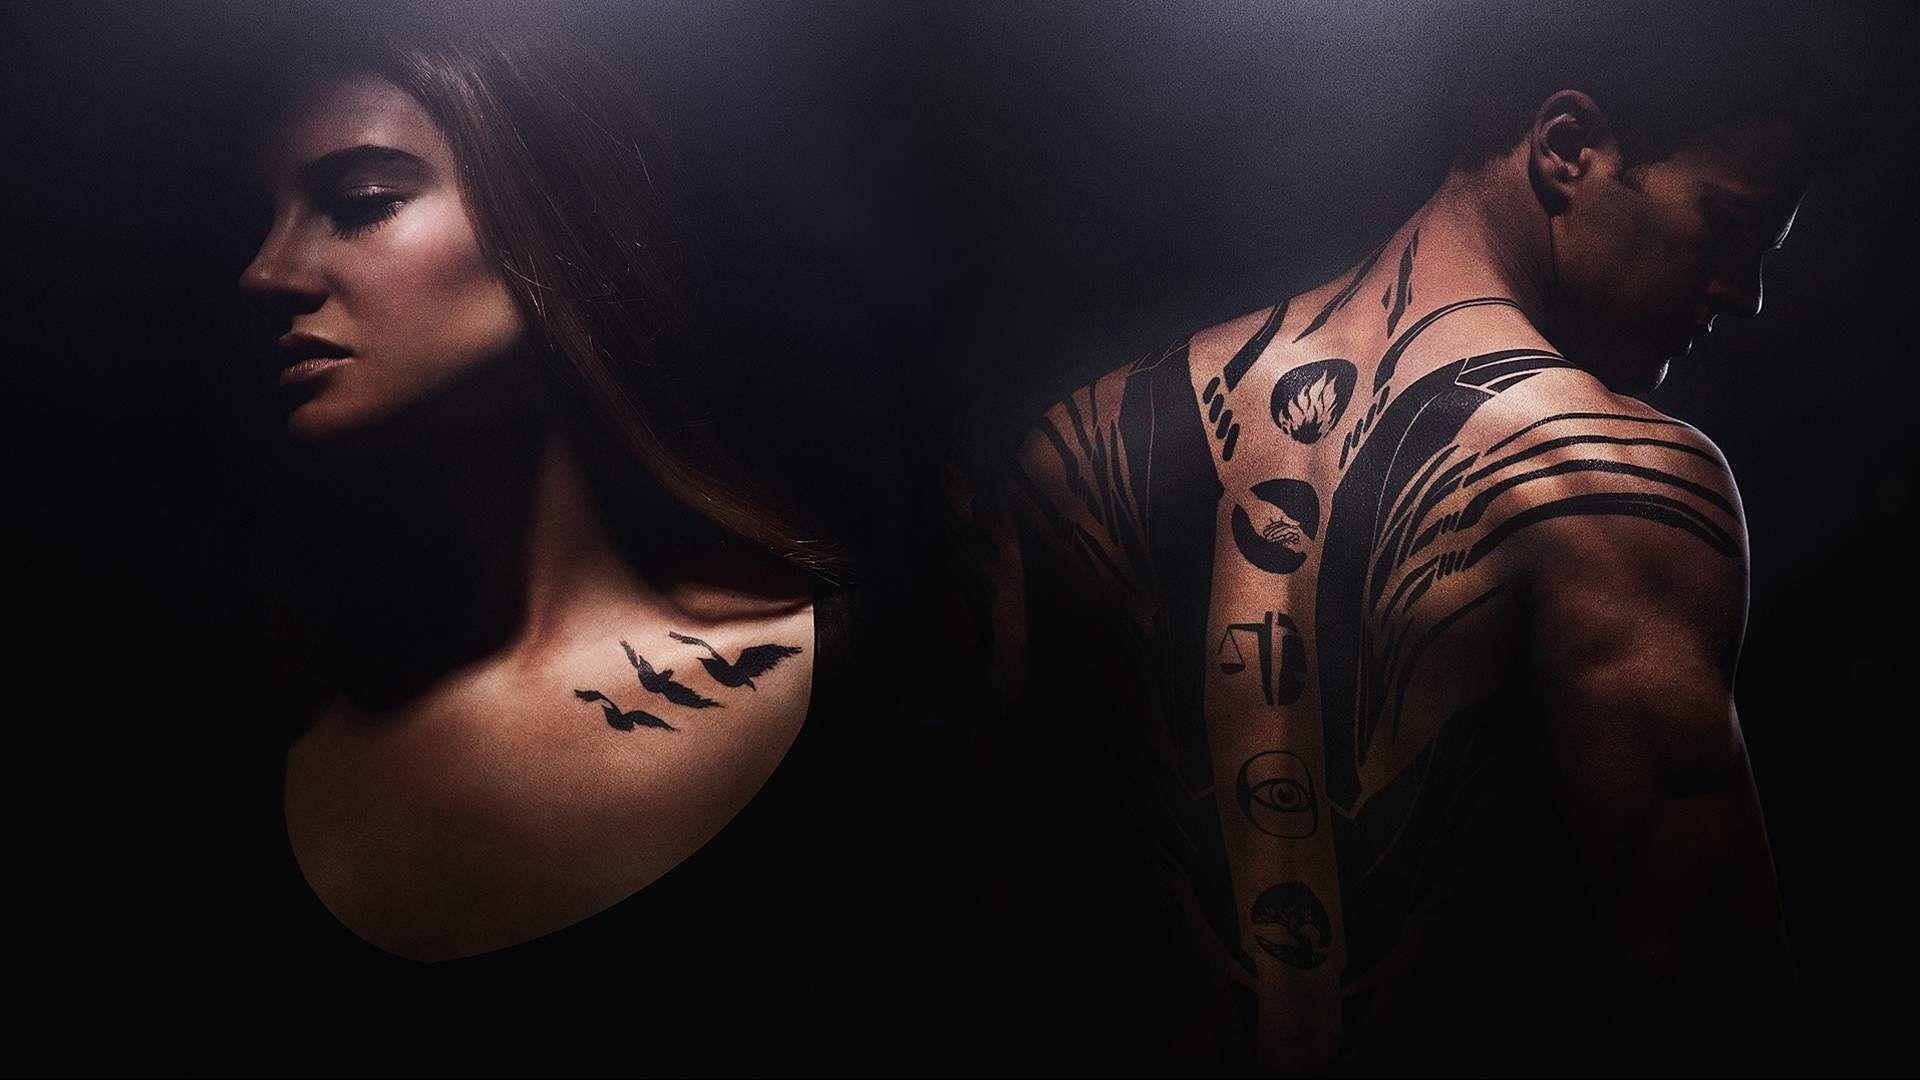 Download Tattoo Design Art Paint Concept Wallpaper Images Hd Free 1280 800 Tattoo Art Wallpapers 38 Wallpapers Divergent Divergent Poster Divergent Tattoo Tattoo photos hd wallpaper download